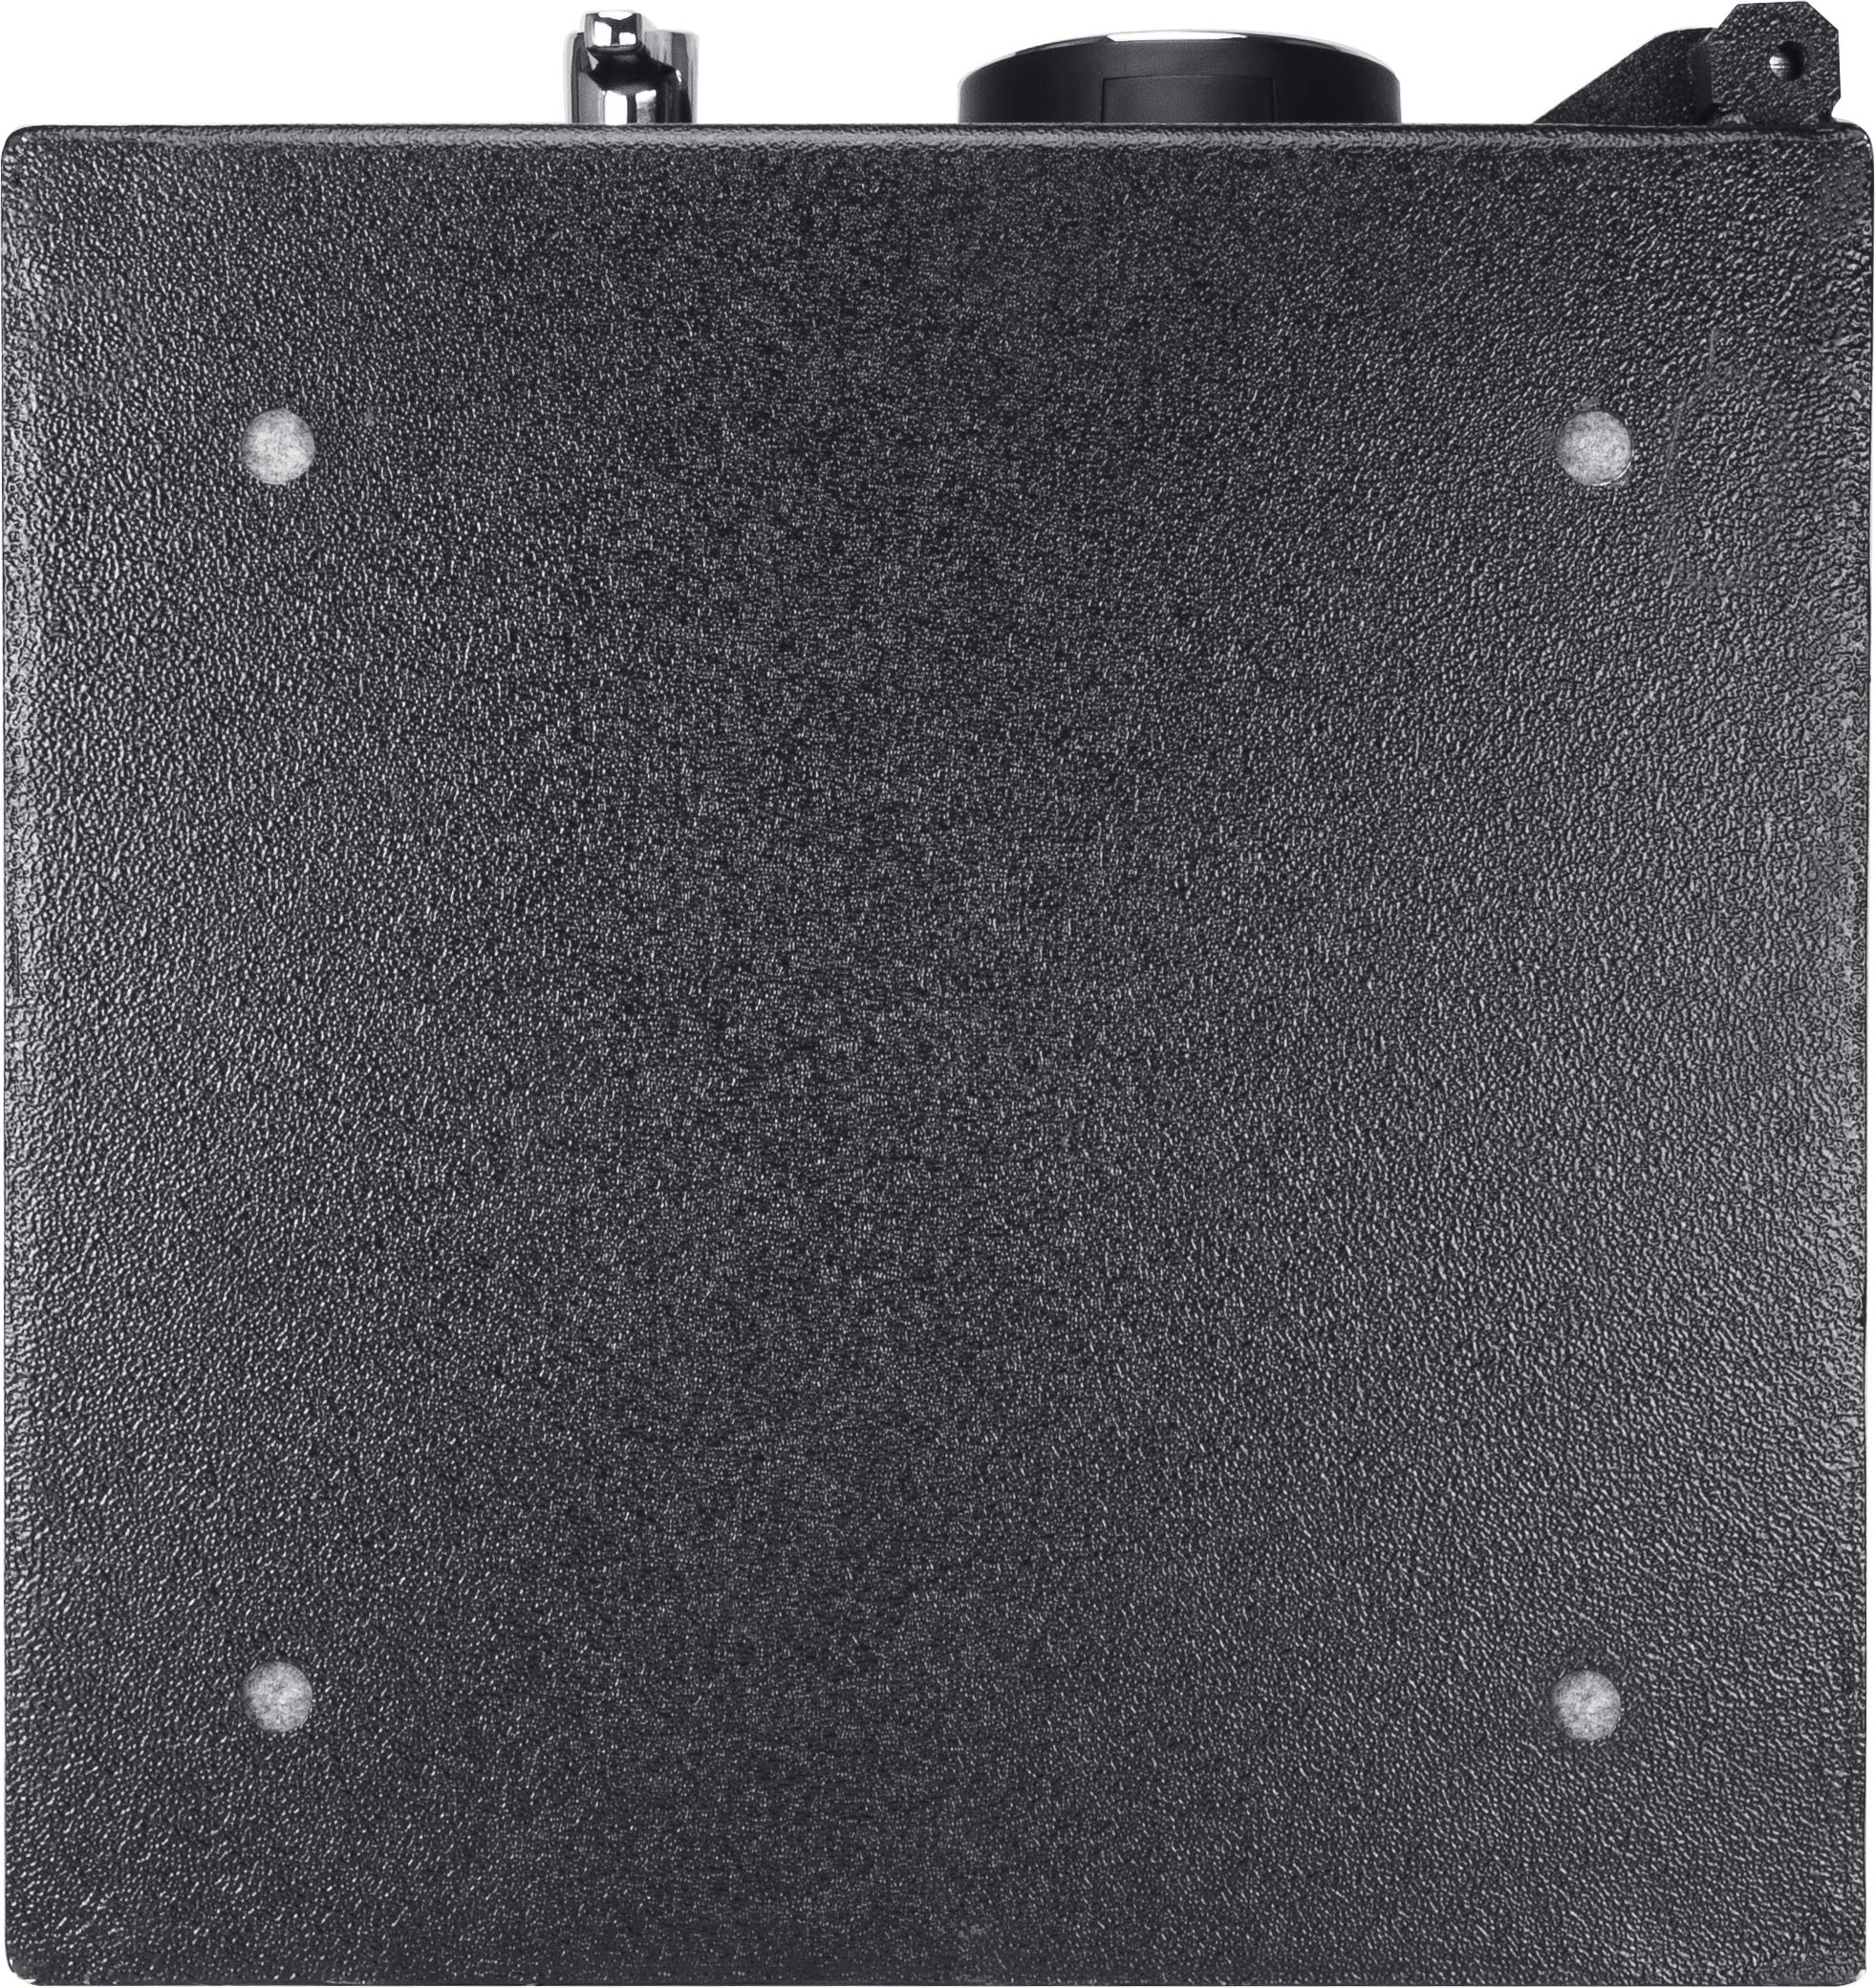 Winbest Steel Digital Keypad Cash Drop Front Loaded Depository Safe Drop Box Storage 1.12 Cubic ft by winbest (Image #5)